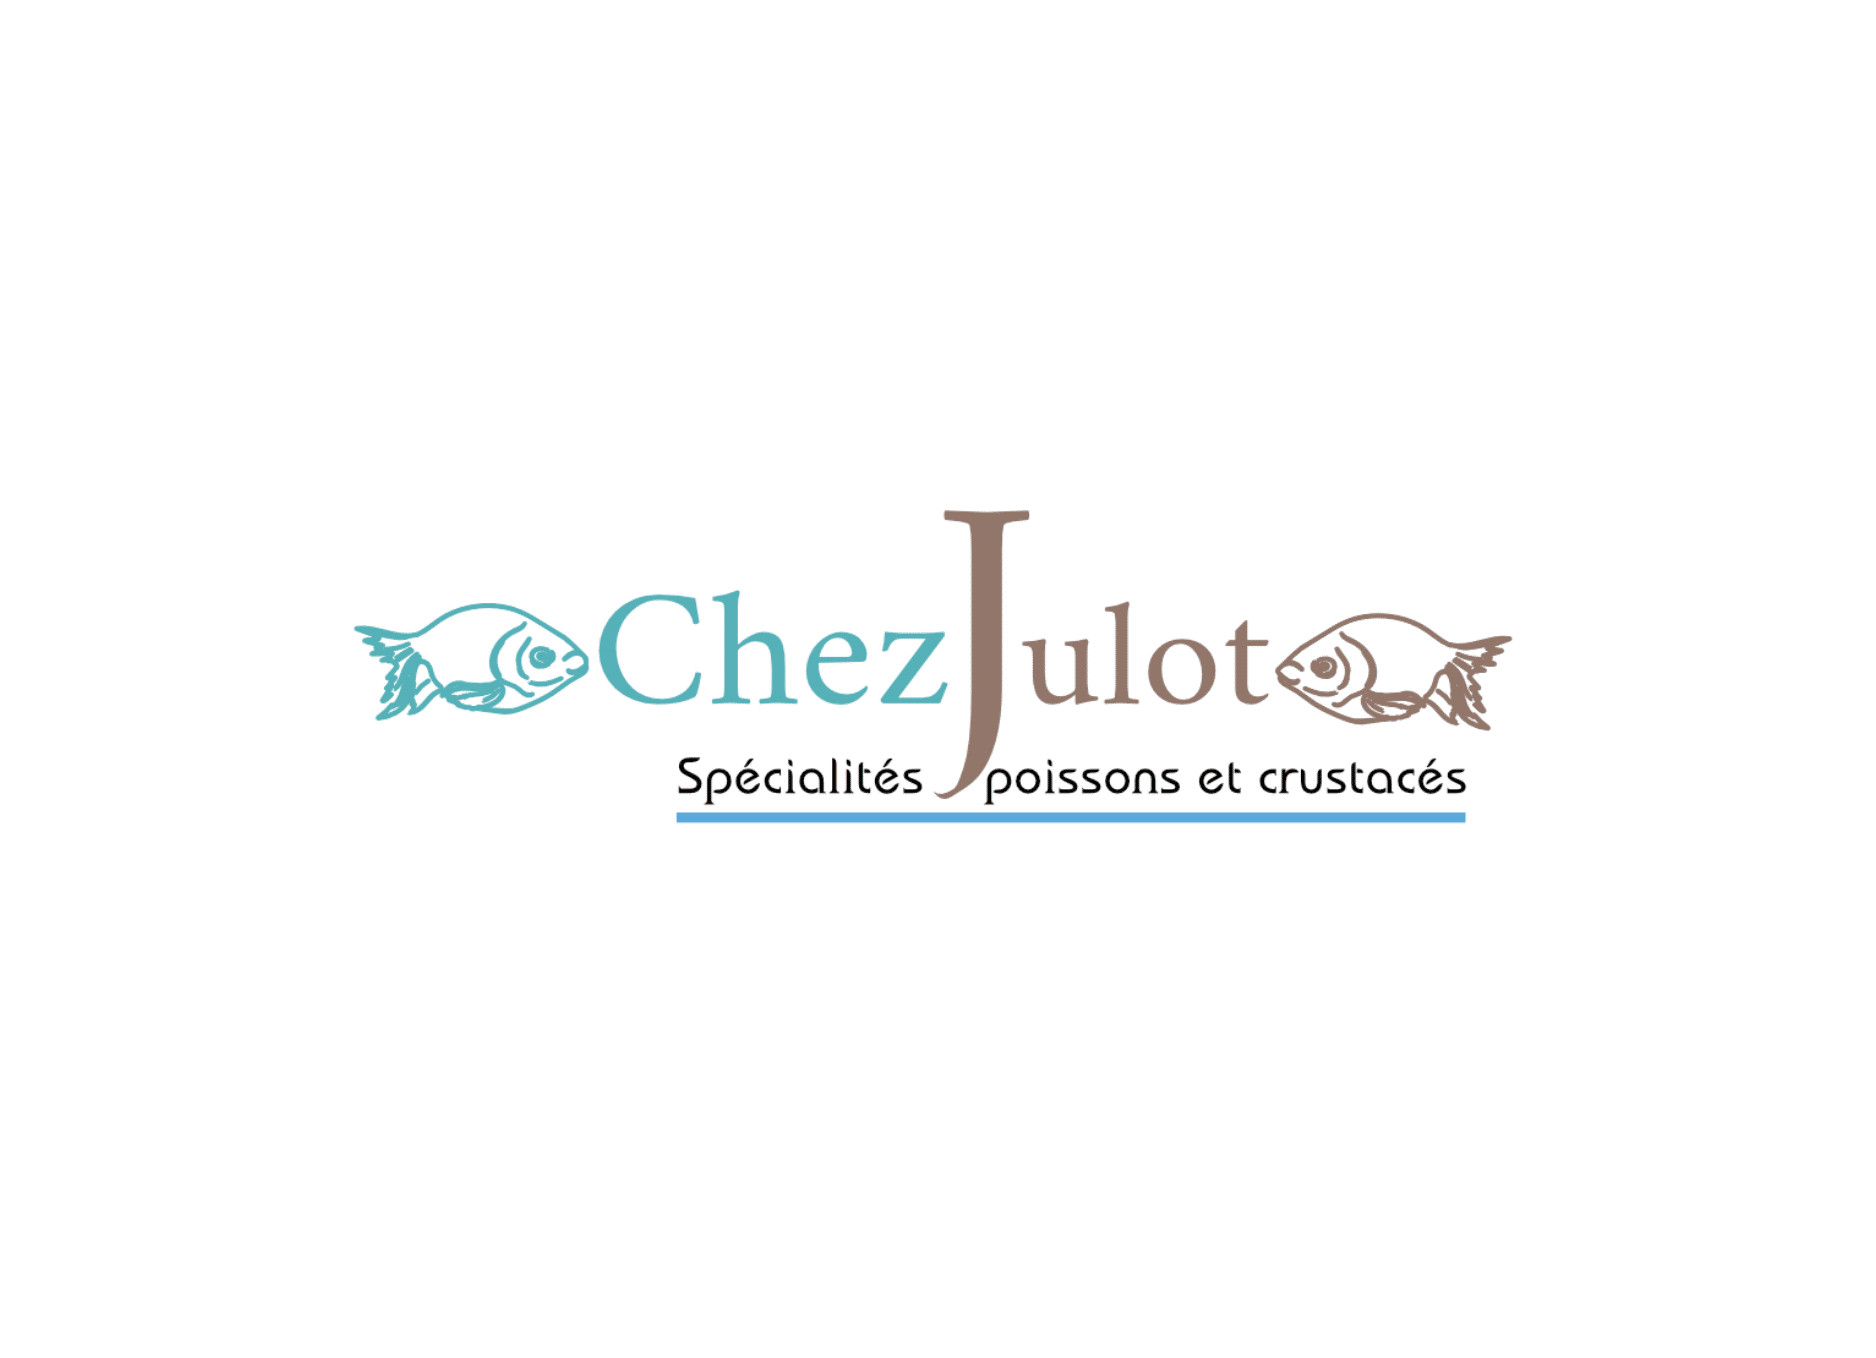 Chez Julot horizontale